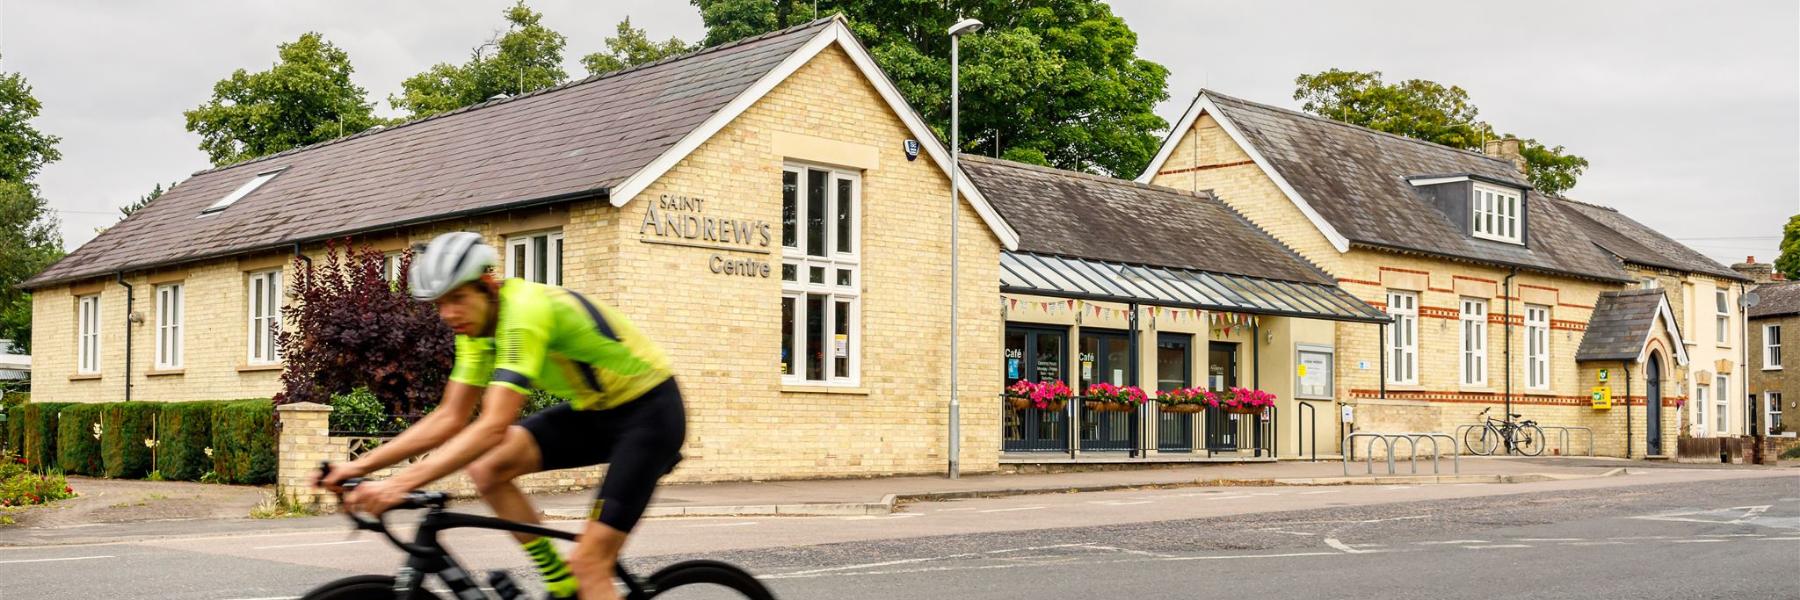 St Andrew's Centre Histon Cambridgeshire